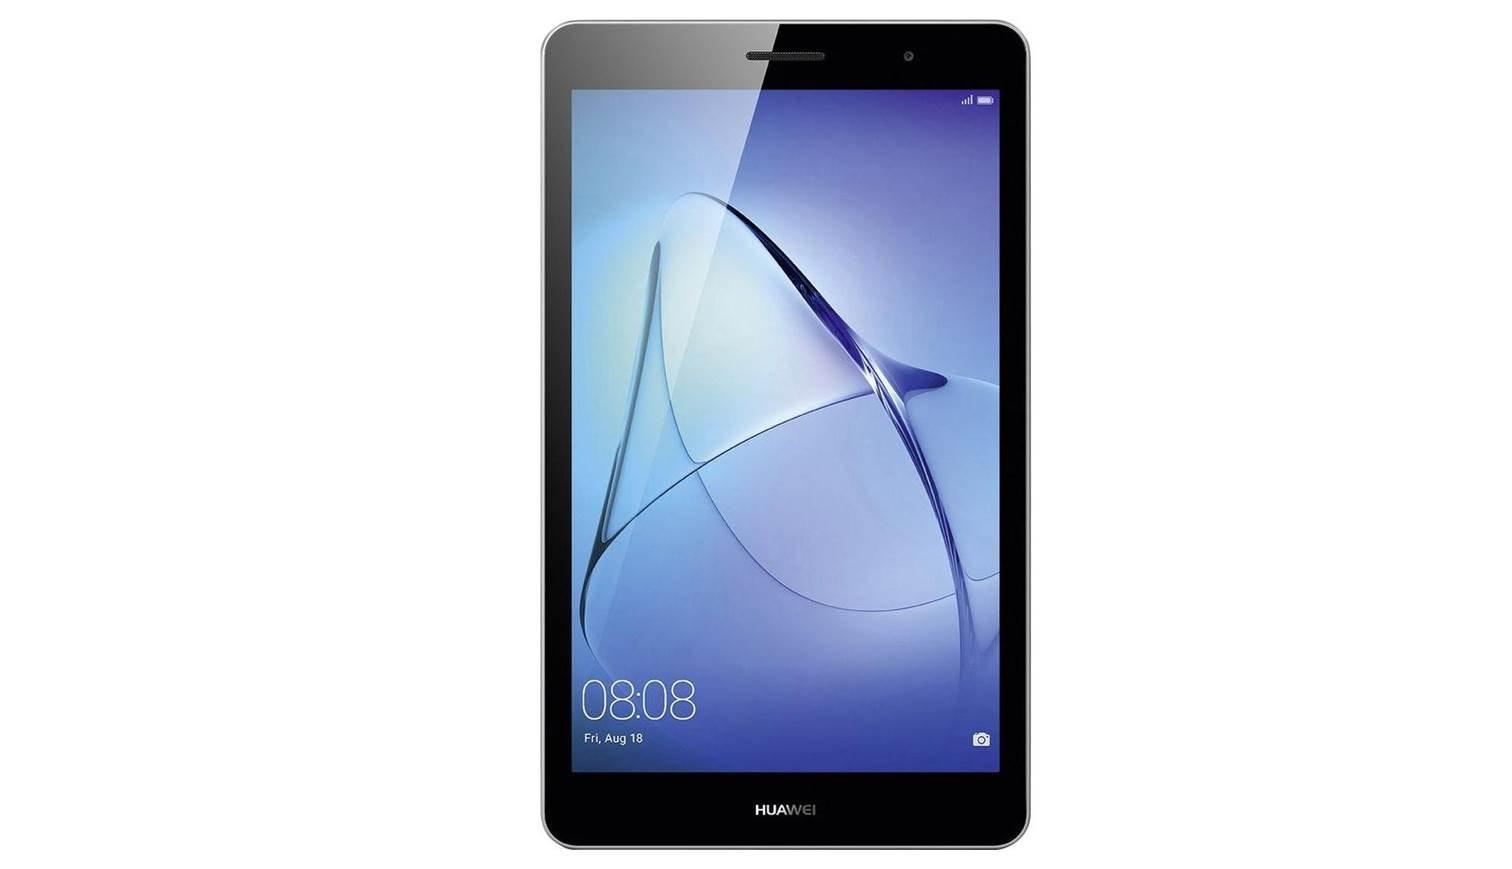 huawei 8 inch tablet. huawei mediapad t3 8\ 8 inch tablet ,